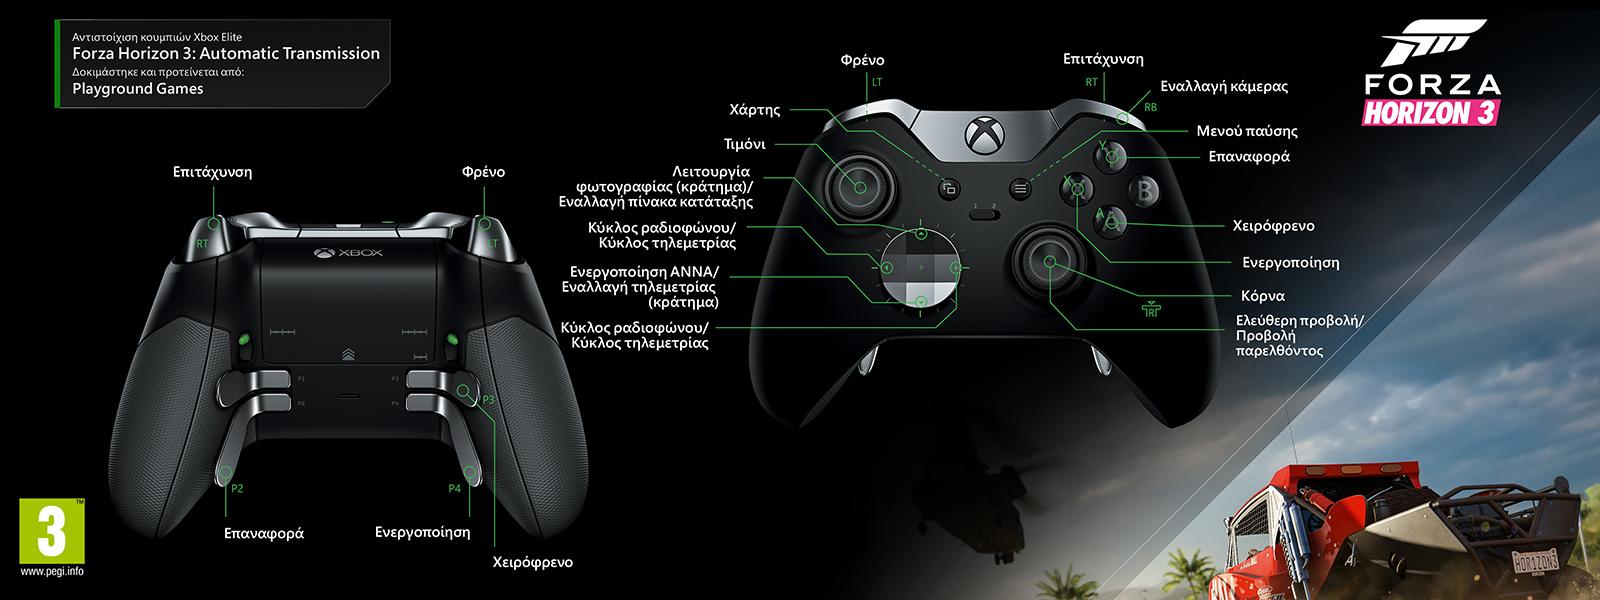 Forza Horizon 3 -Χαρτογράφηση Automatic Transmission Elite